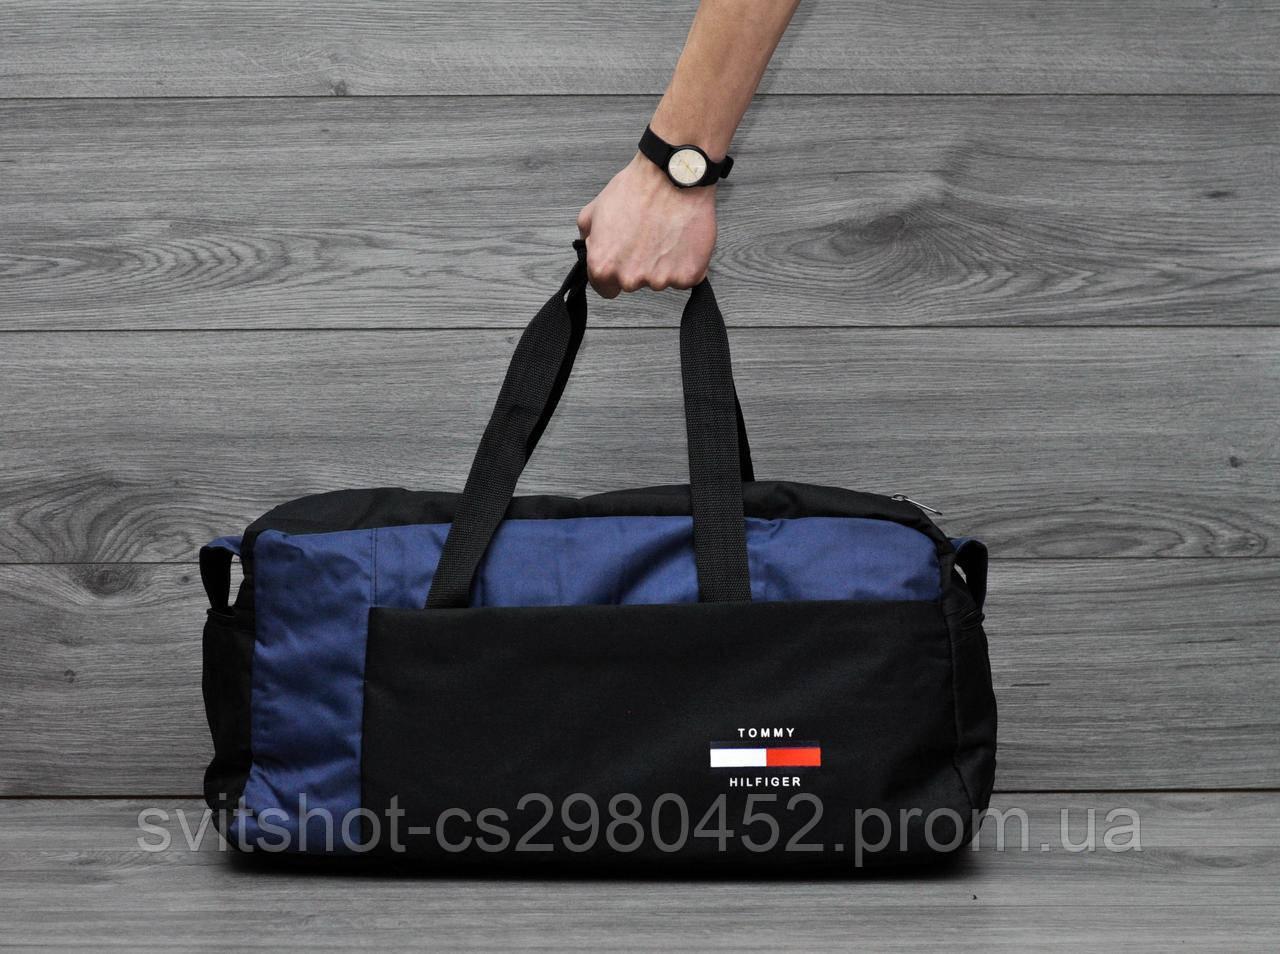 de37617def37 Спортивная сумка Tommy Hilfiger (Томми Хилфигер), Sport Bag - Svitshot.net в